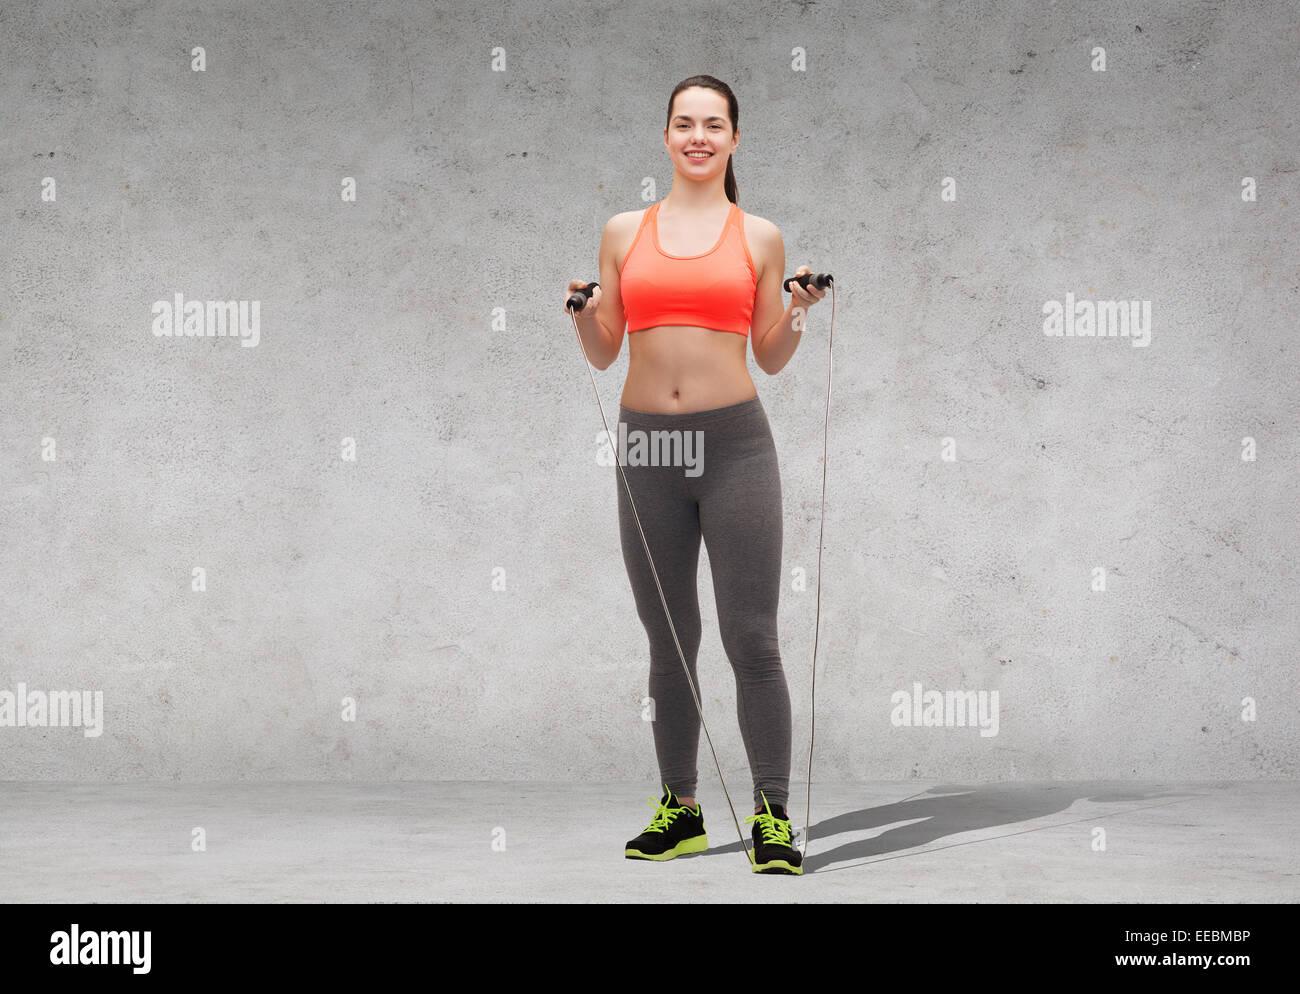 sportliche Frau mit Springseil Stockbild